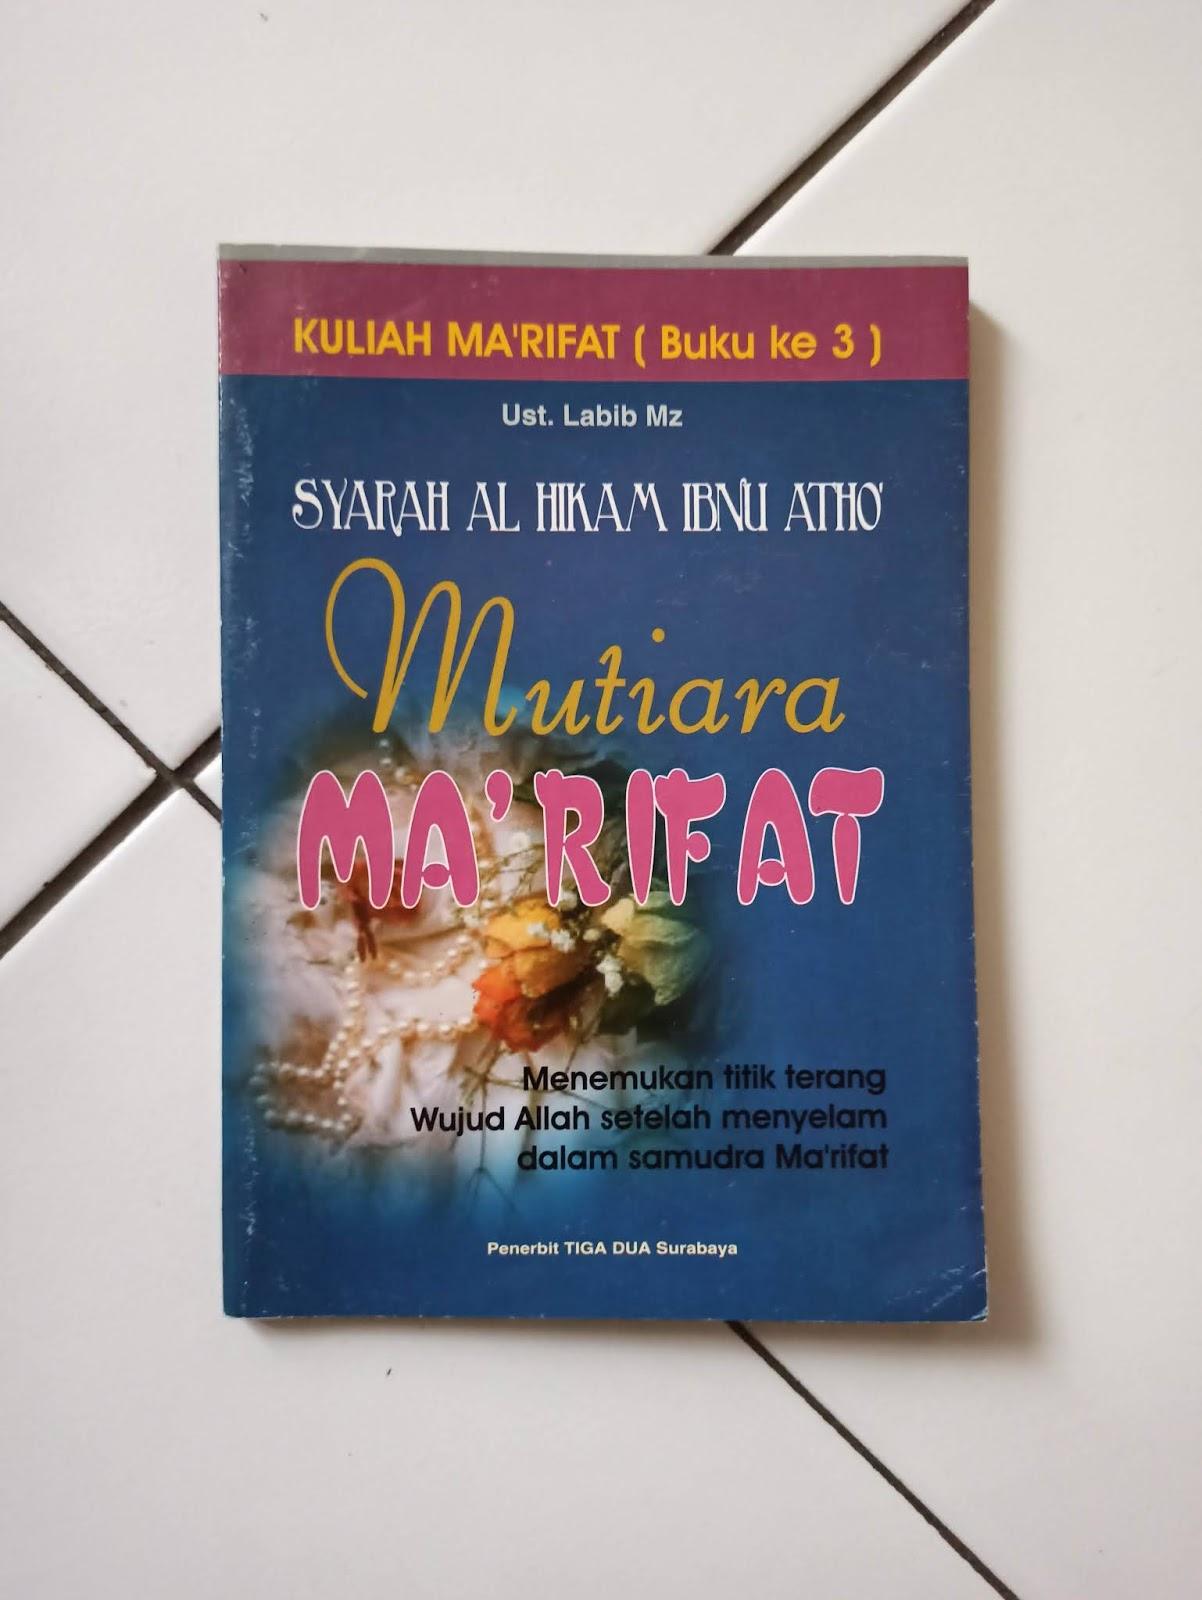 Buku Karya Ustaz Labib Mz